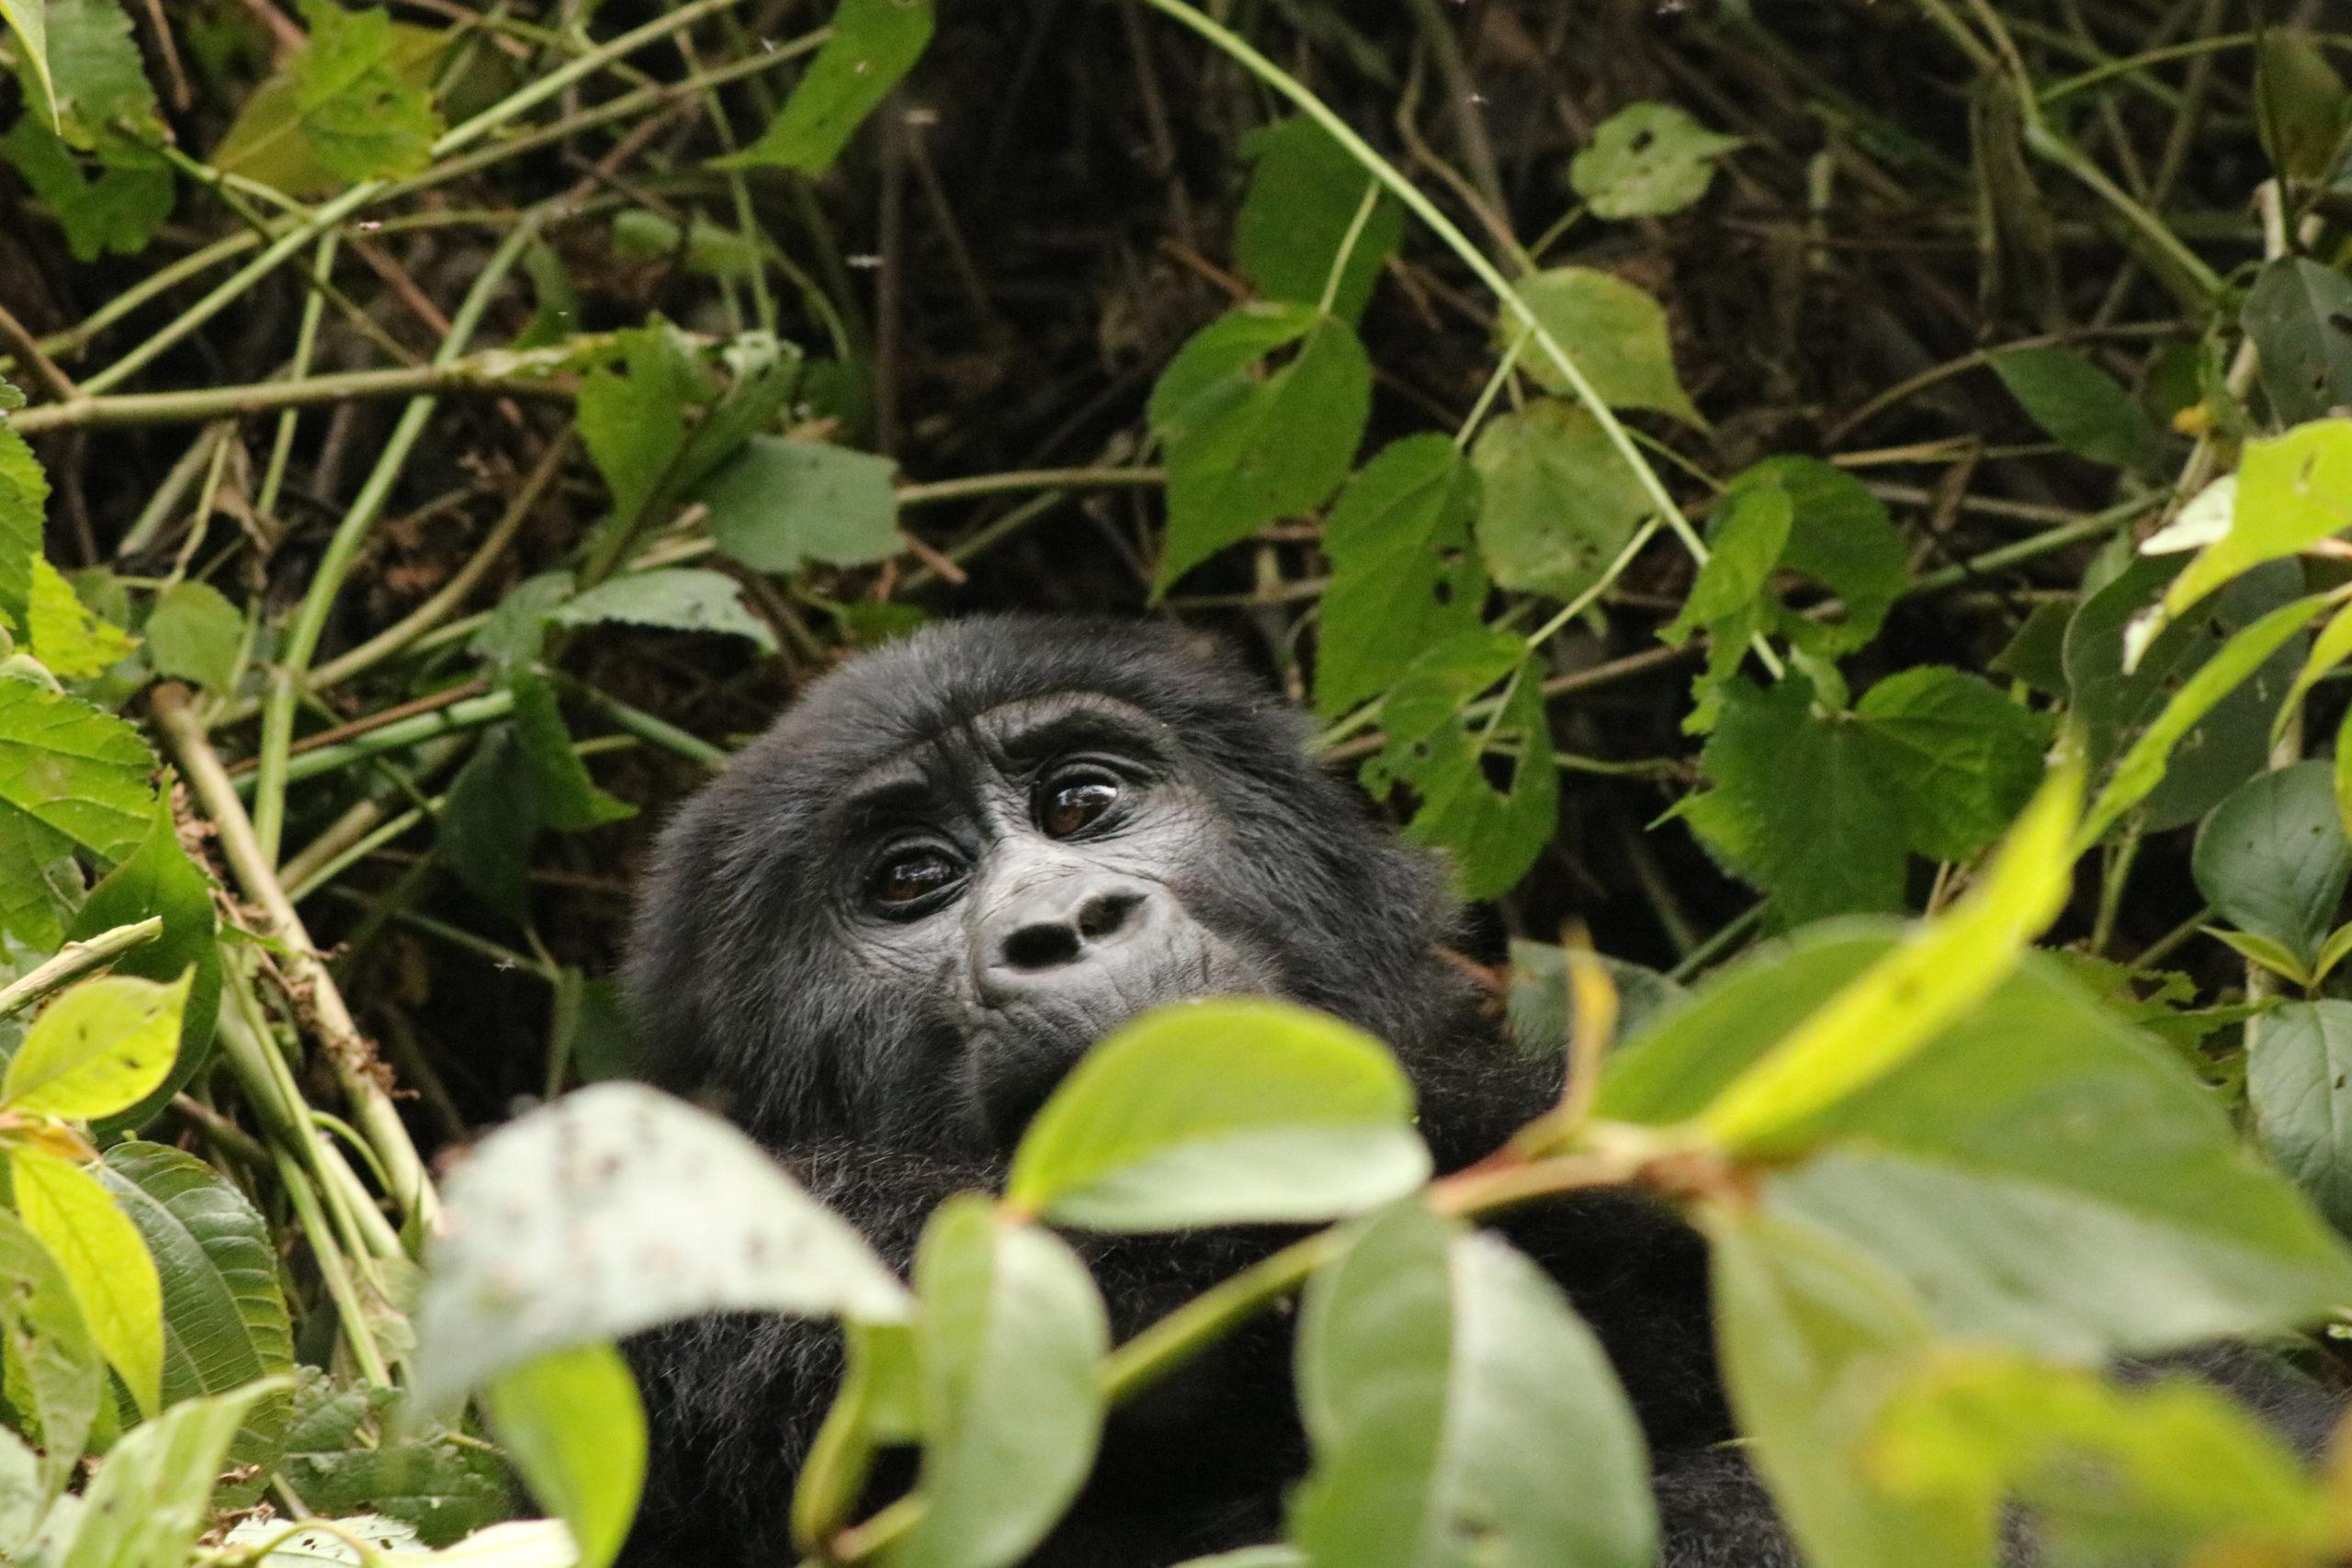 Photos: Gorilla Trekking in Bwindi National Park, Uganda